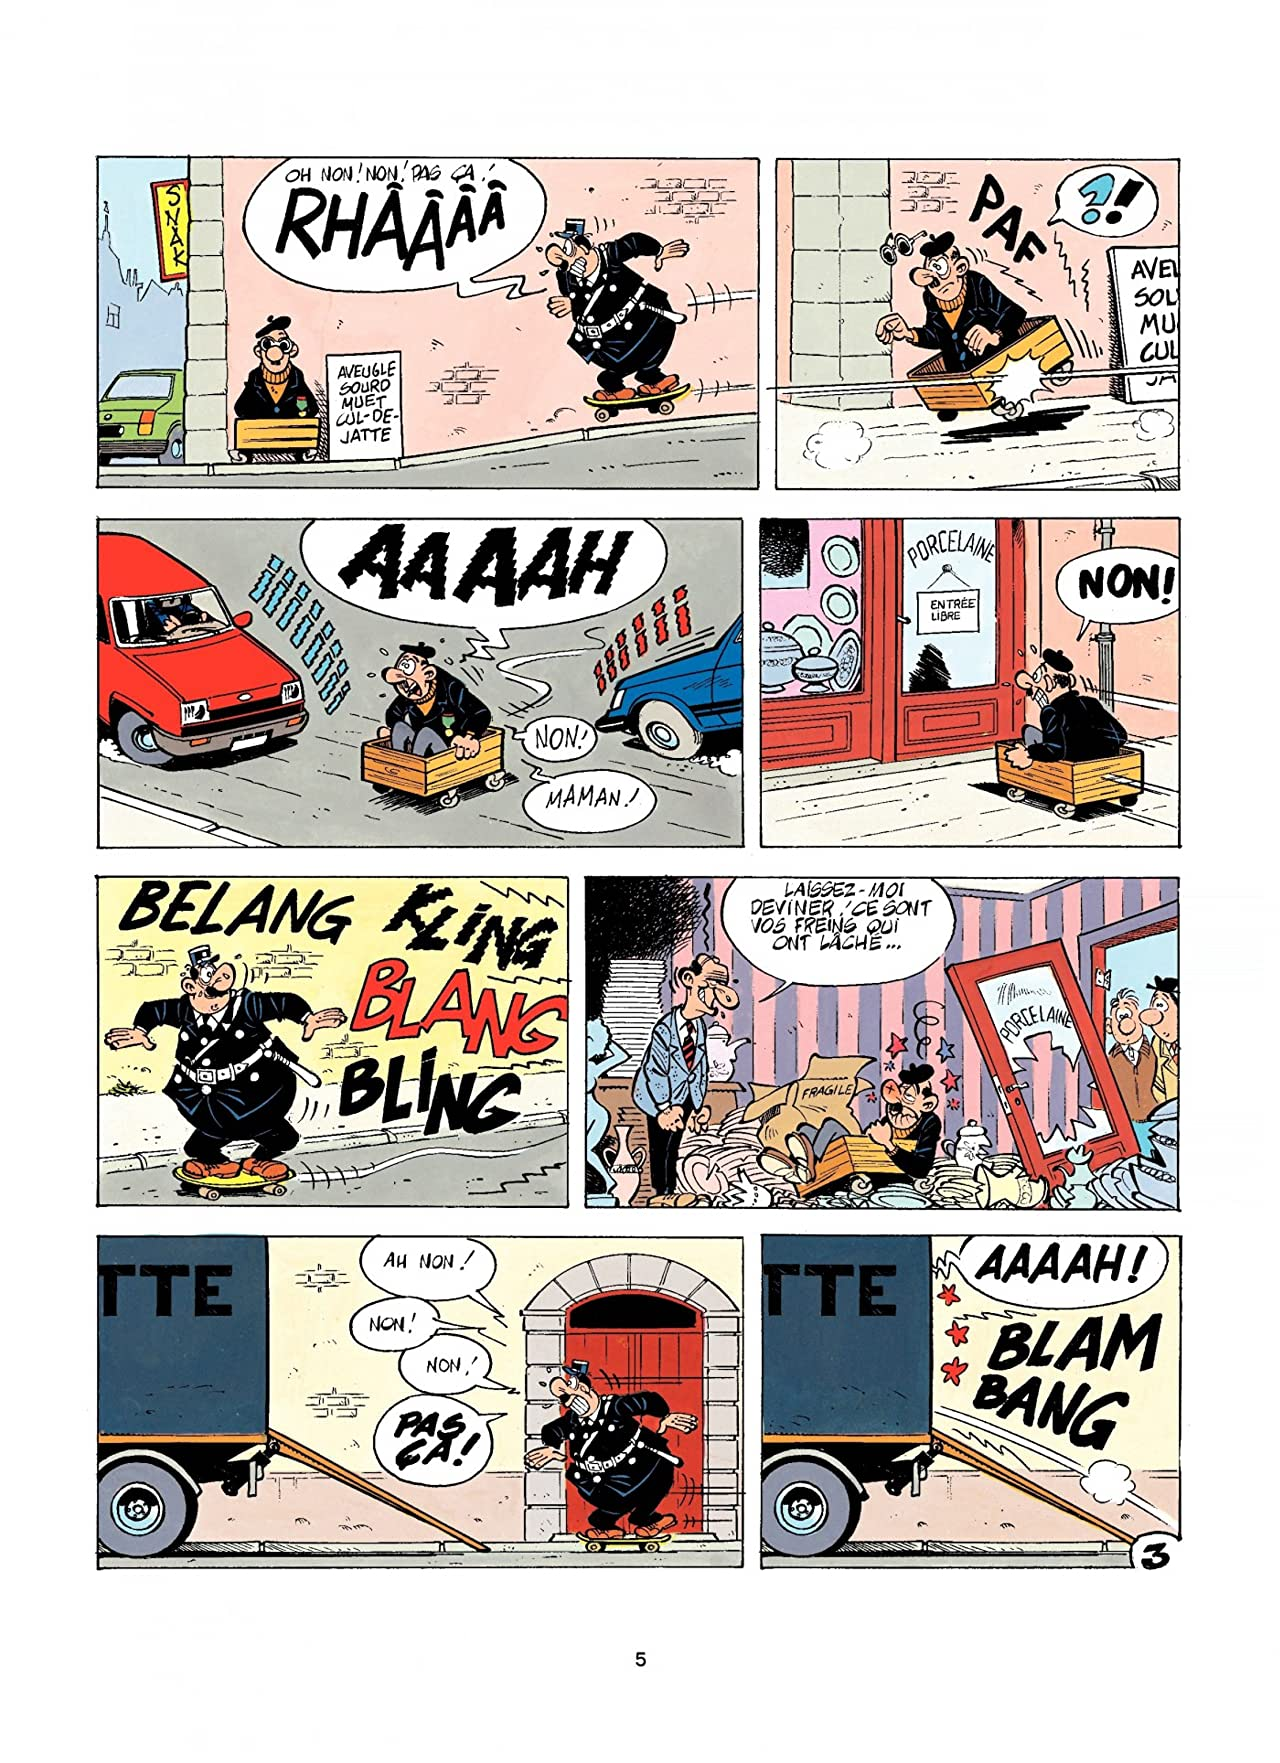 L'Agent 212 Vol. 9: BRIGADE MOBILE